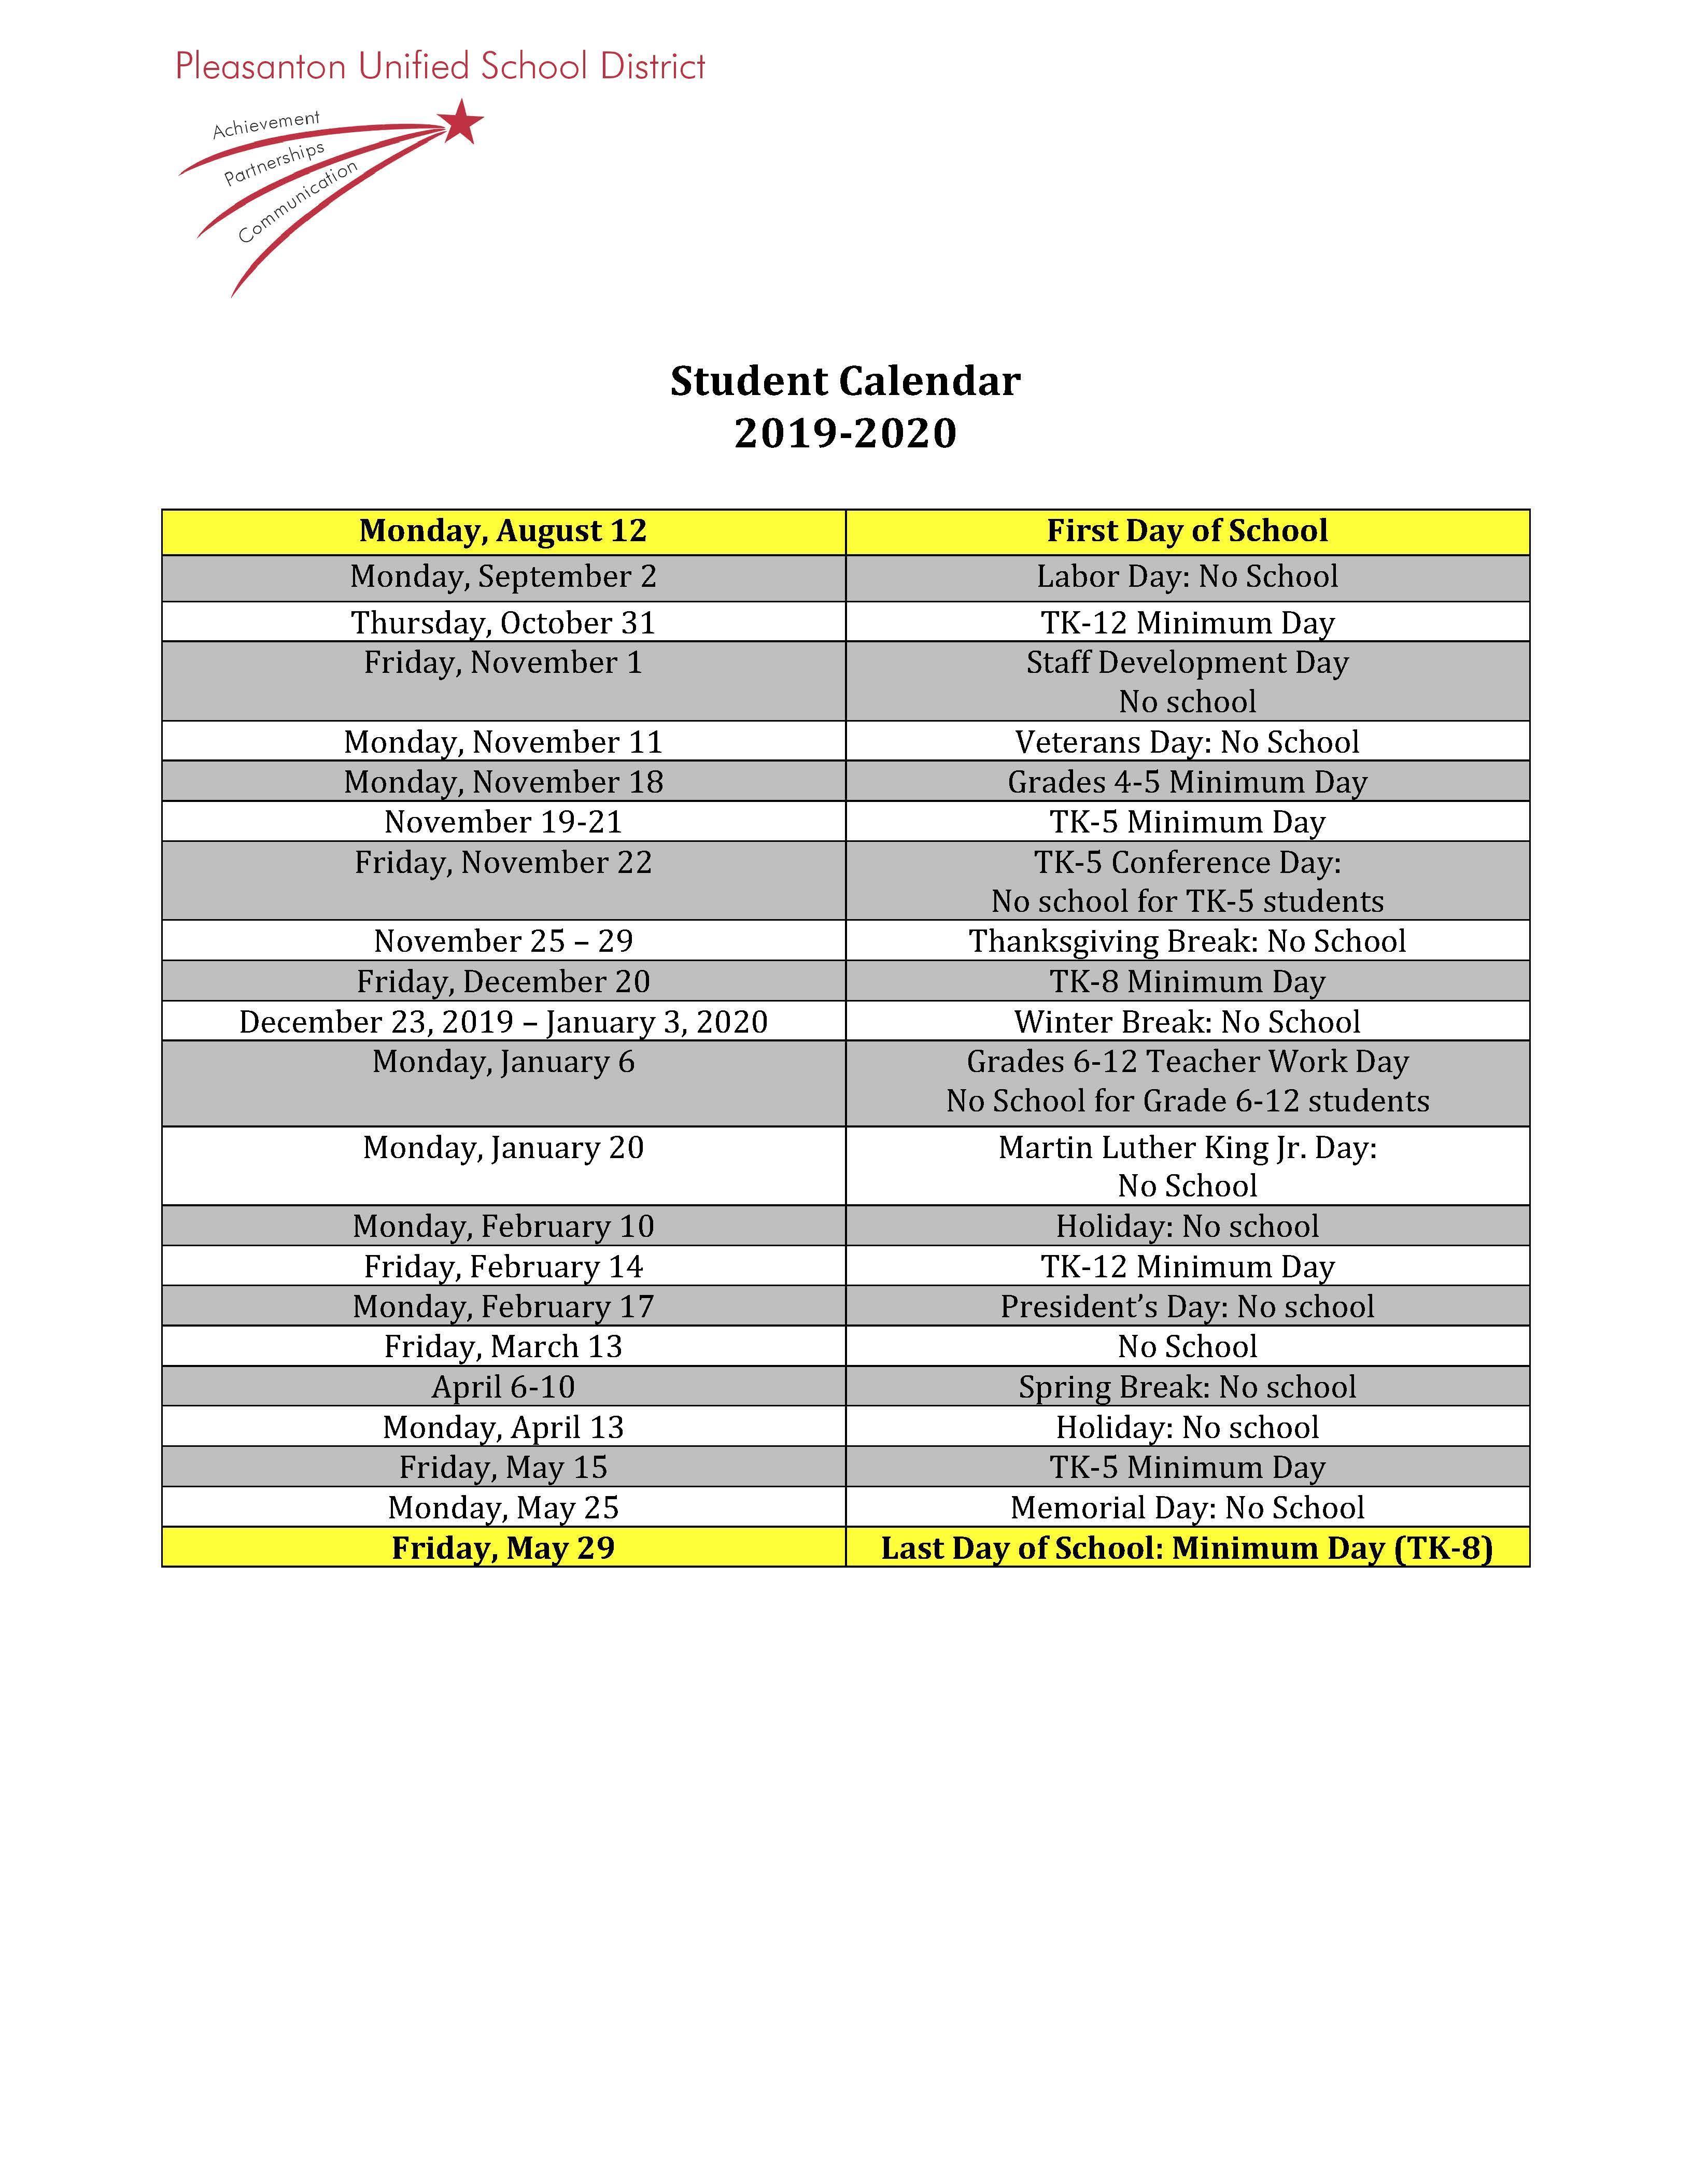 Calendars - Miscellaneous - Pleasanton Unified School District with Walnut Hills High School 2021-2020 Calendar